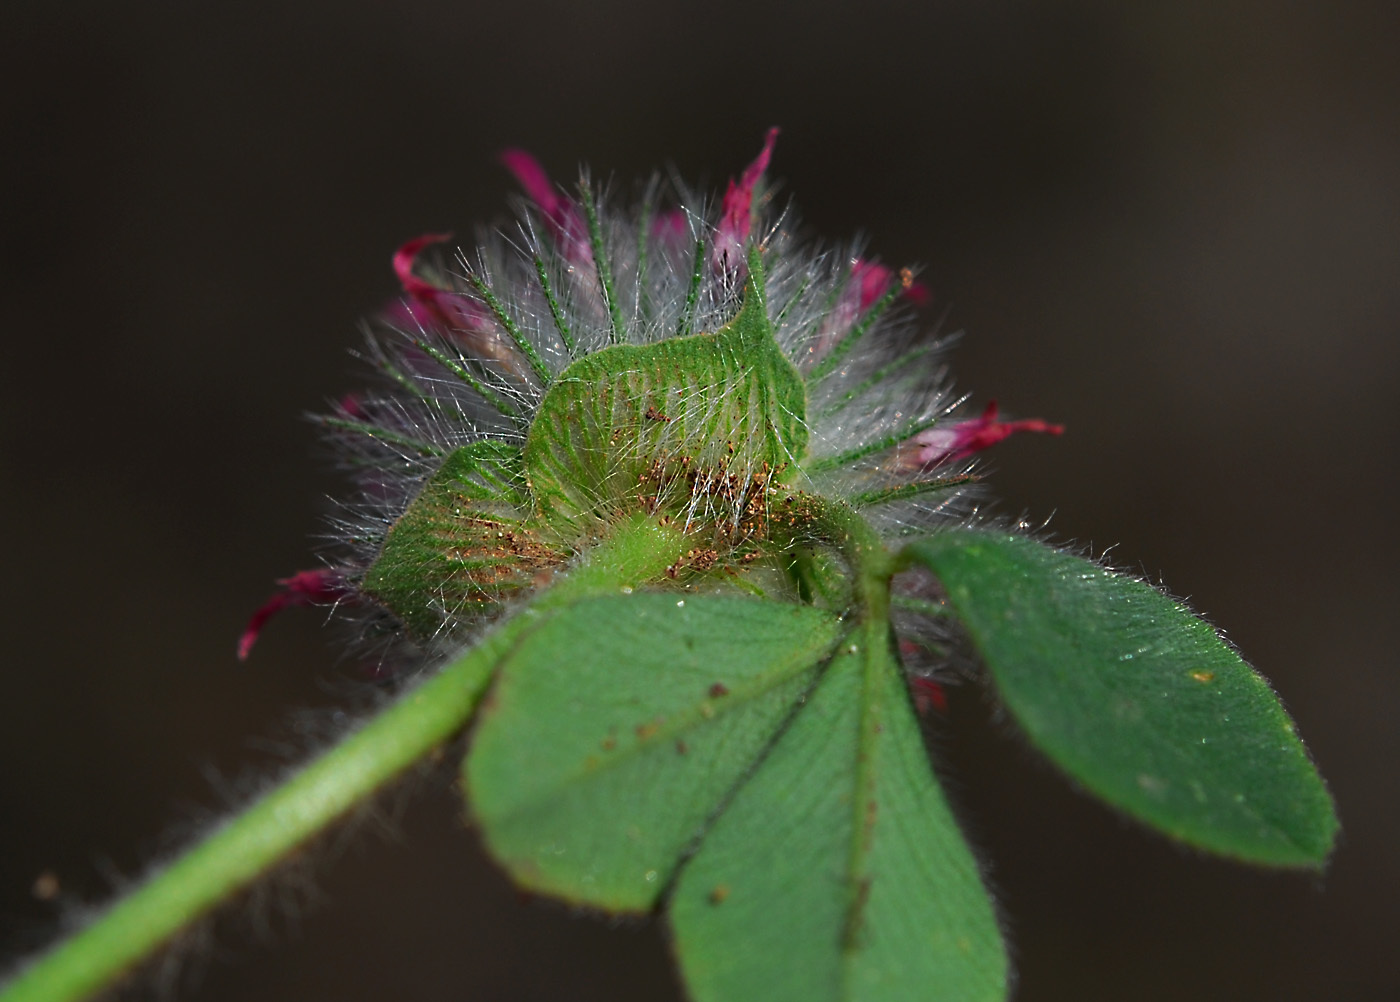 https://pictures.bgbm.org/digilib/Scaler?fn=Cyprus/Trifolium_hirtum_D1.jpg&mo=file